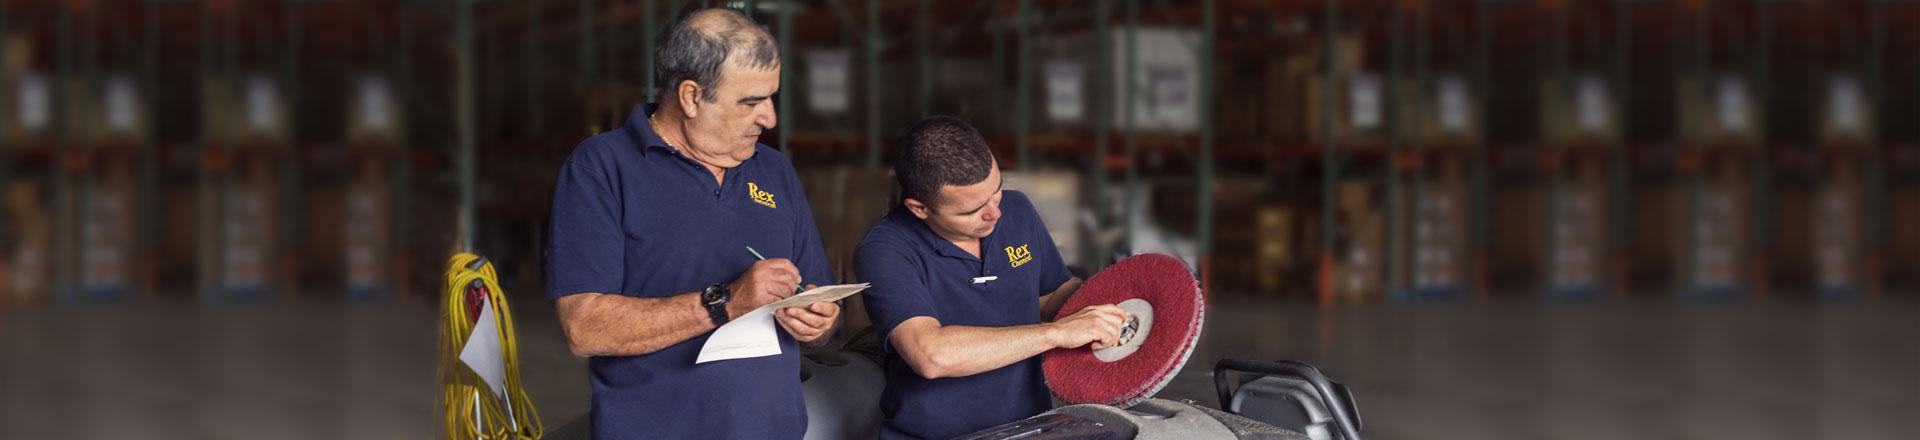 REX TECHNICAL SERVICES